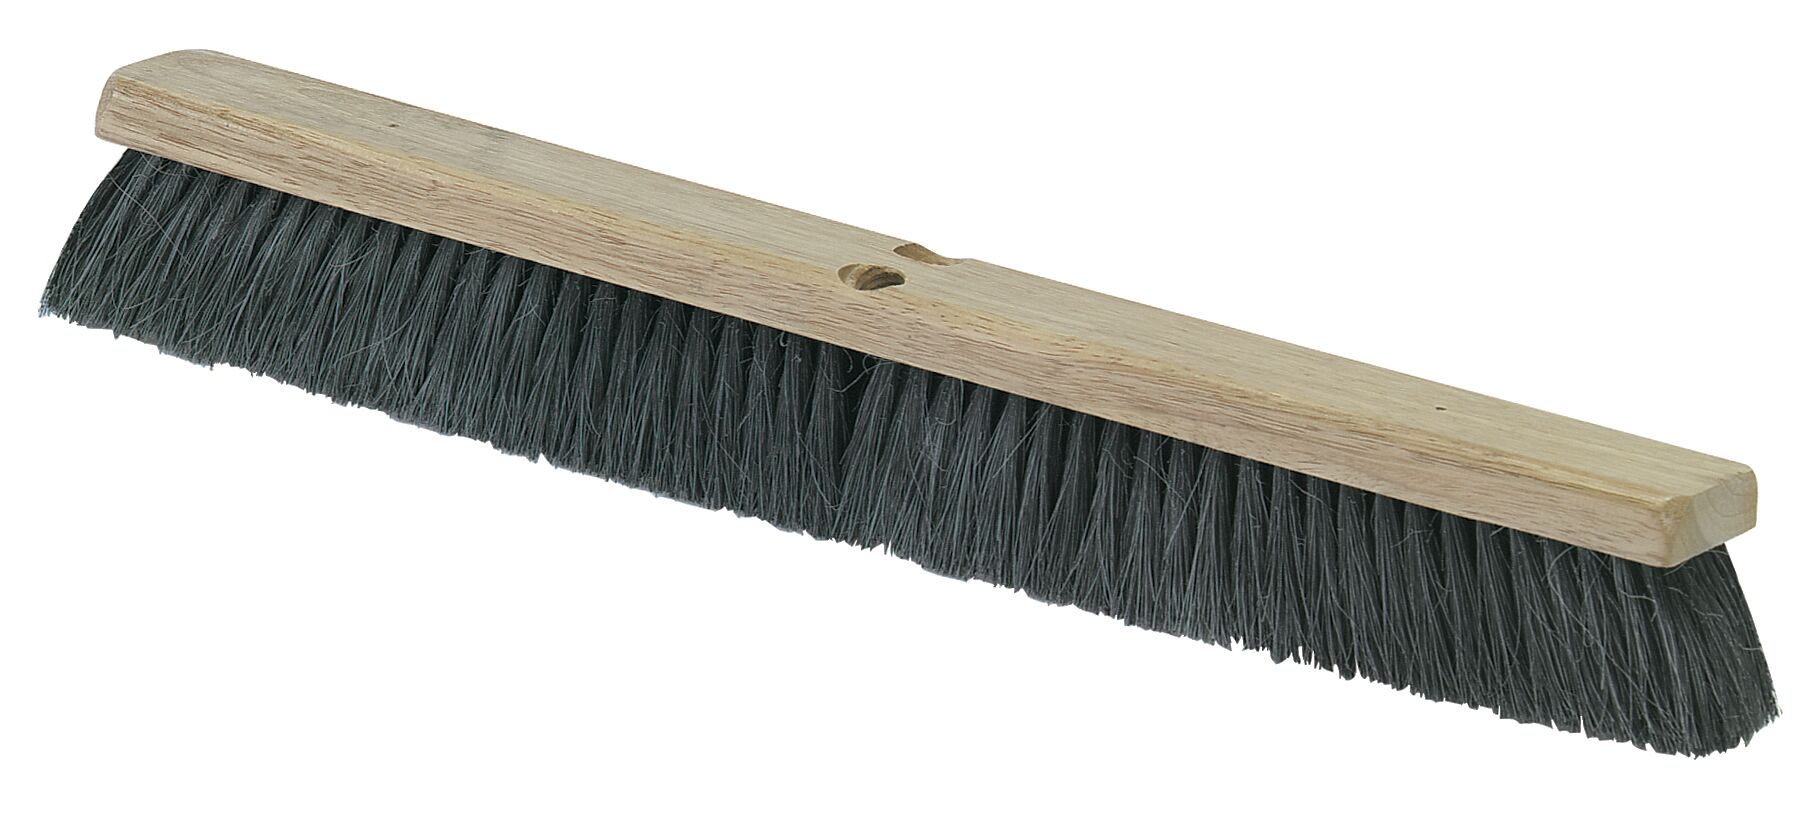 Flo-Pac® Tampico Floor Brush (Set of 12) Size: 24